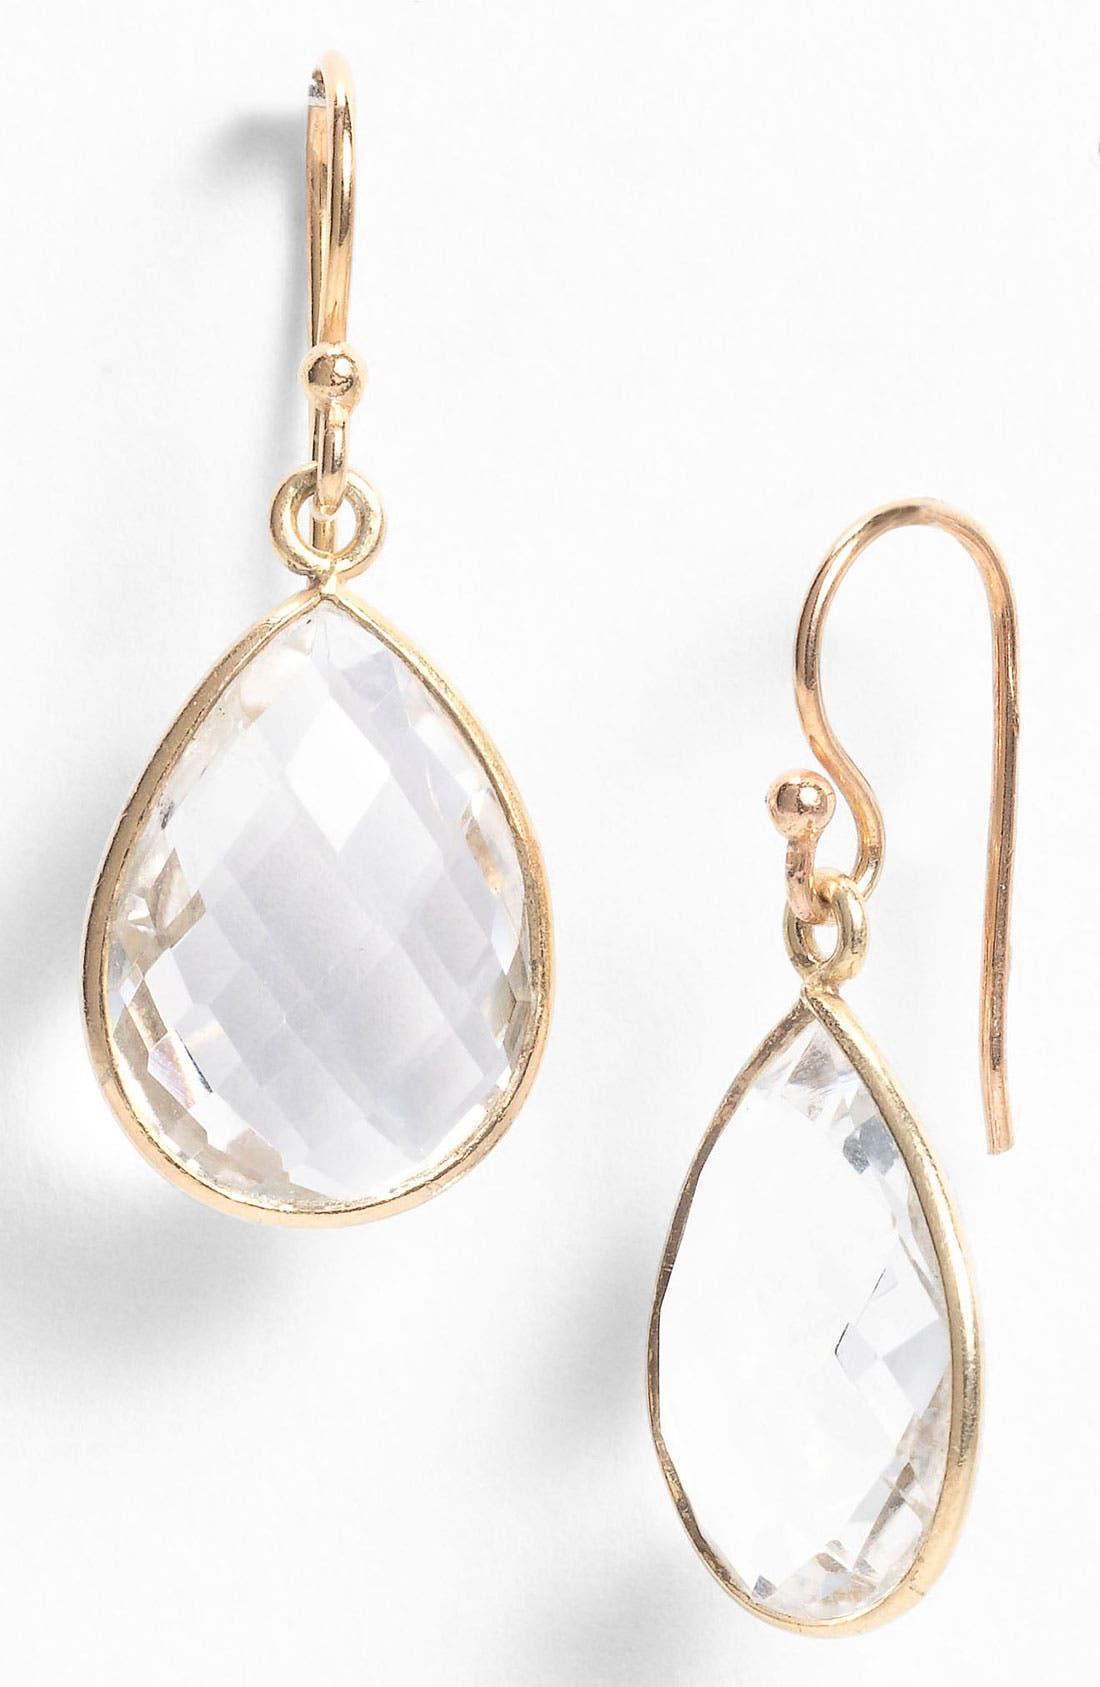 Alternate Image 1 Selected - NuNu Designs 'Candy' Teardrop Earrings